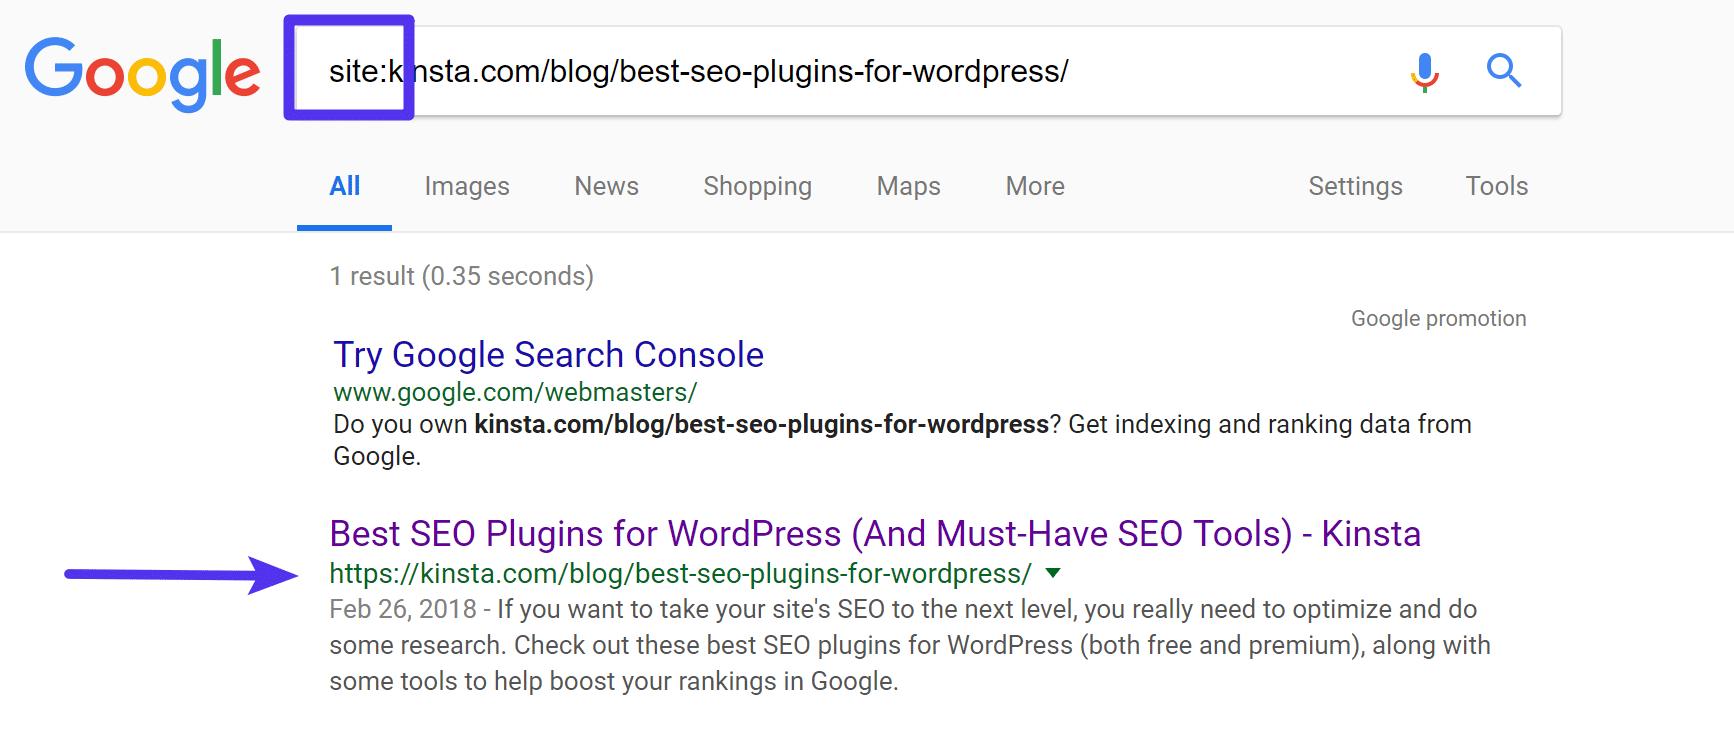 Vérifiez si Google indexe l'URL